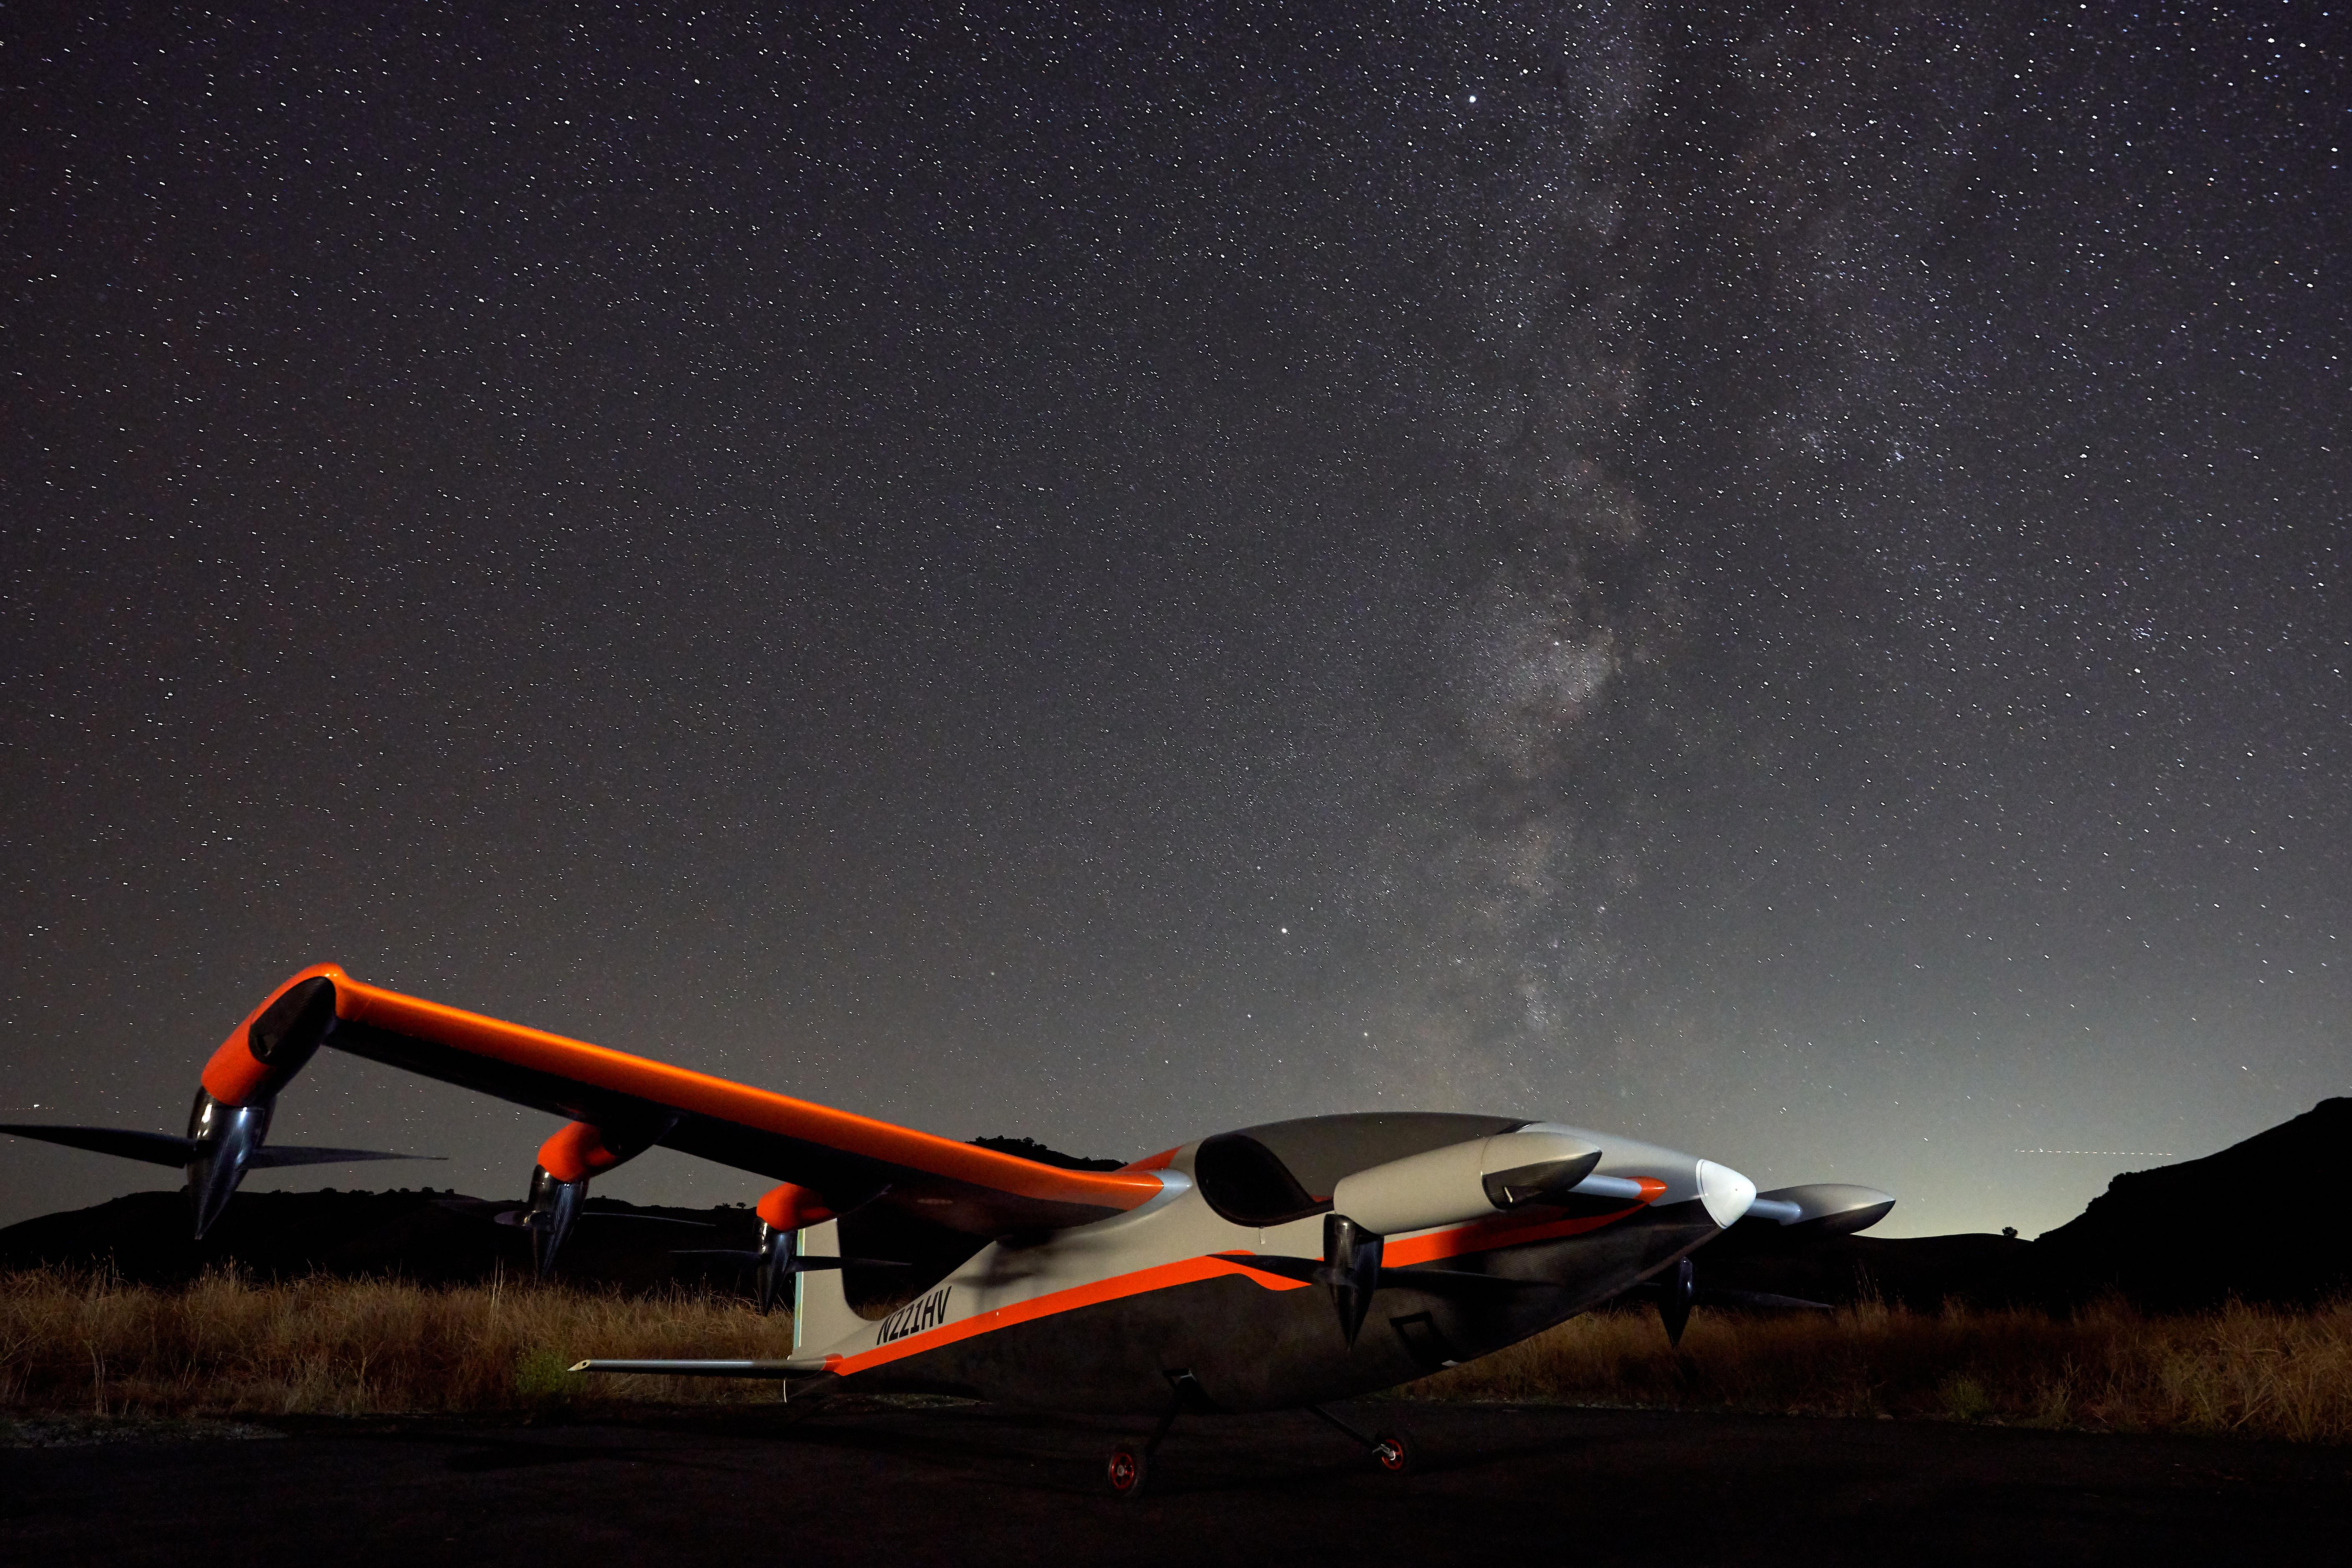 Kitty Hawk Heaviside starry night